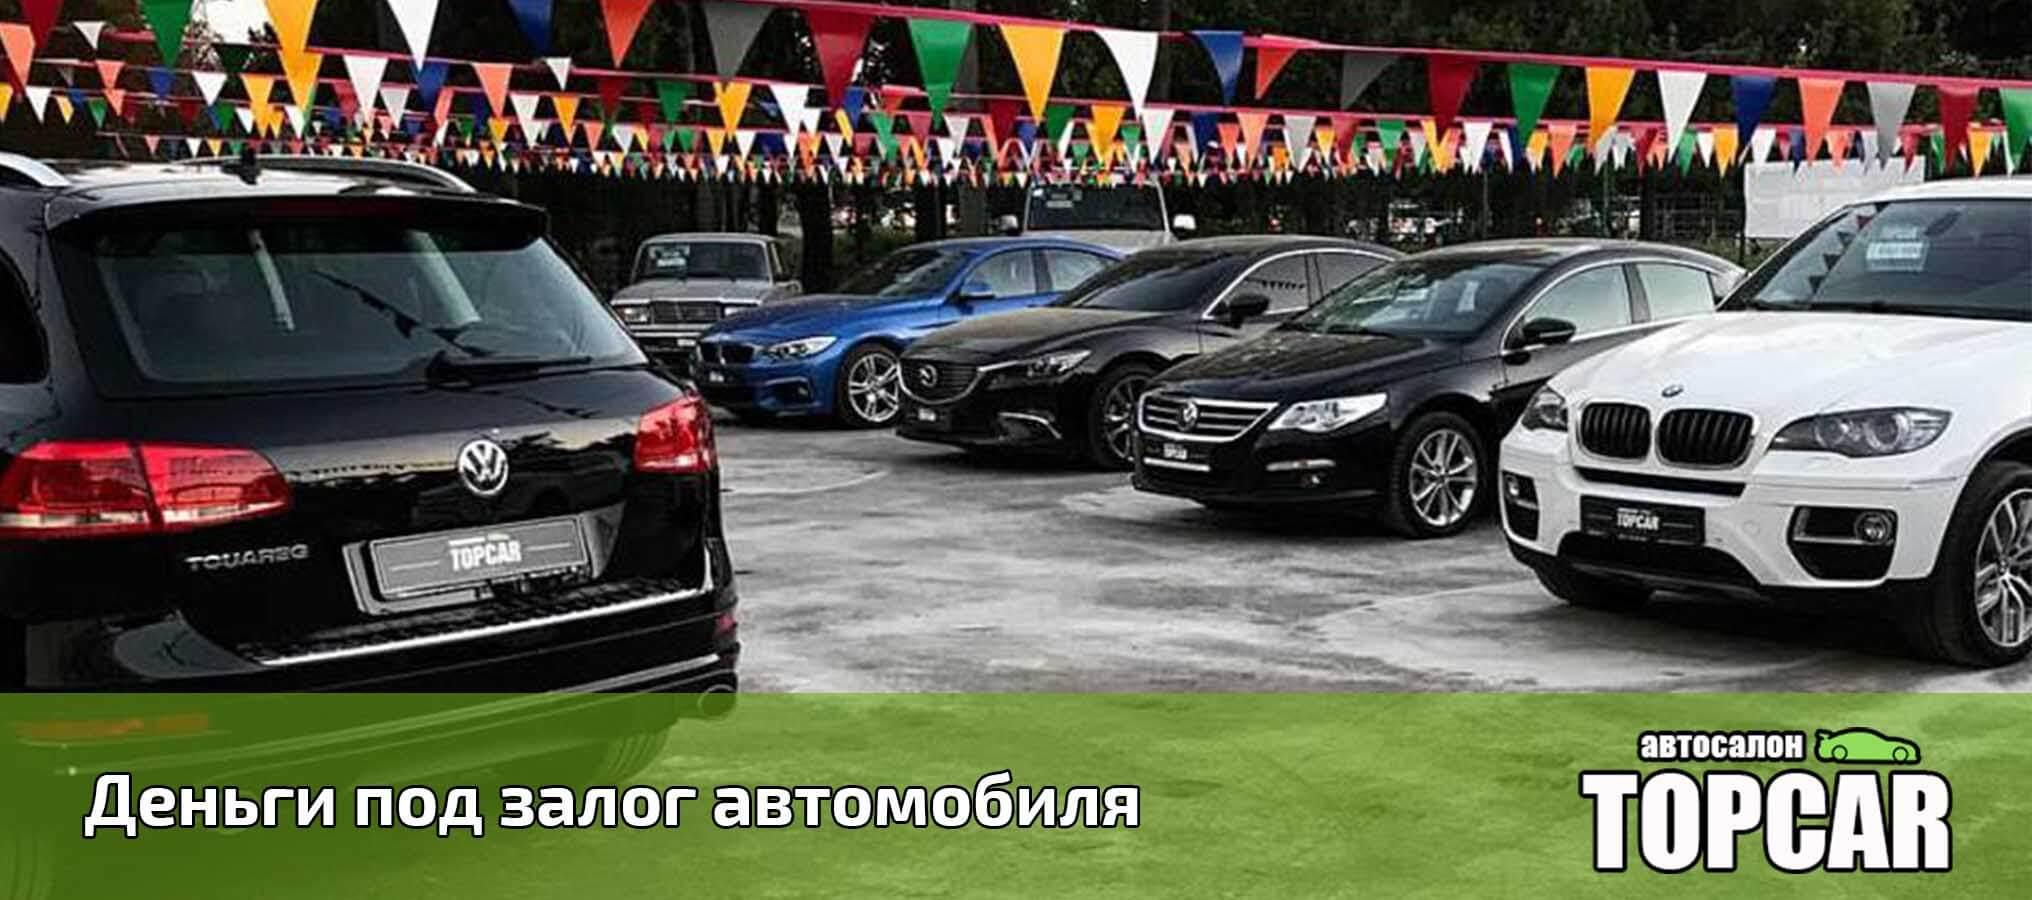 Деньги под залог автомобиля краснодар